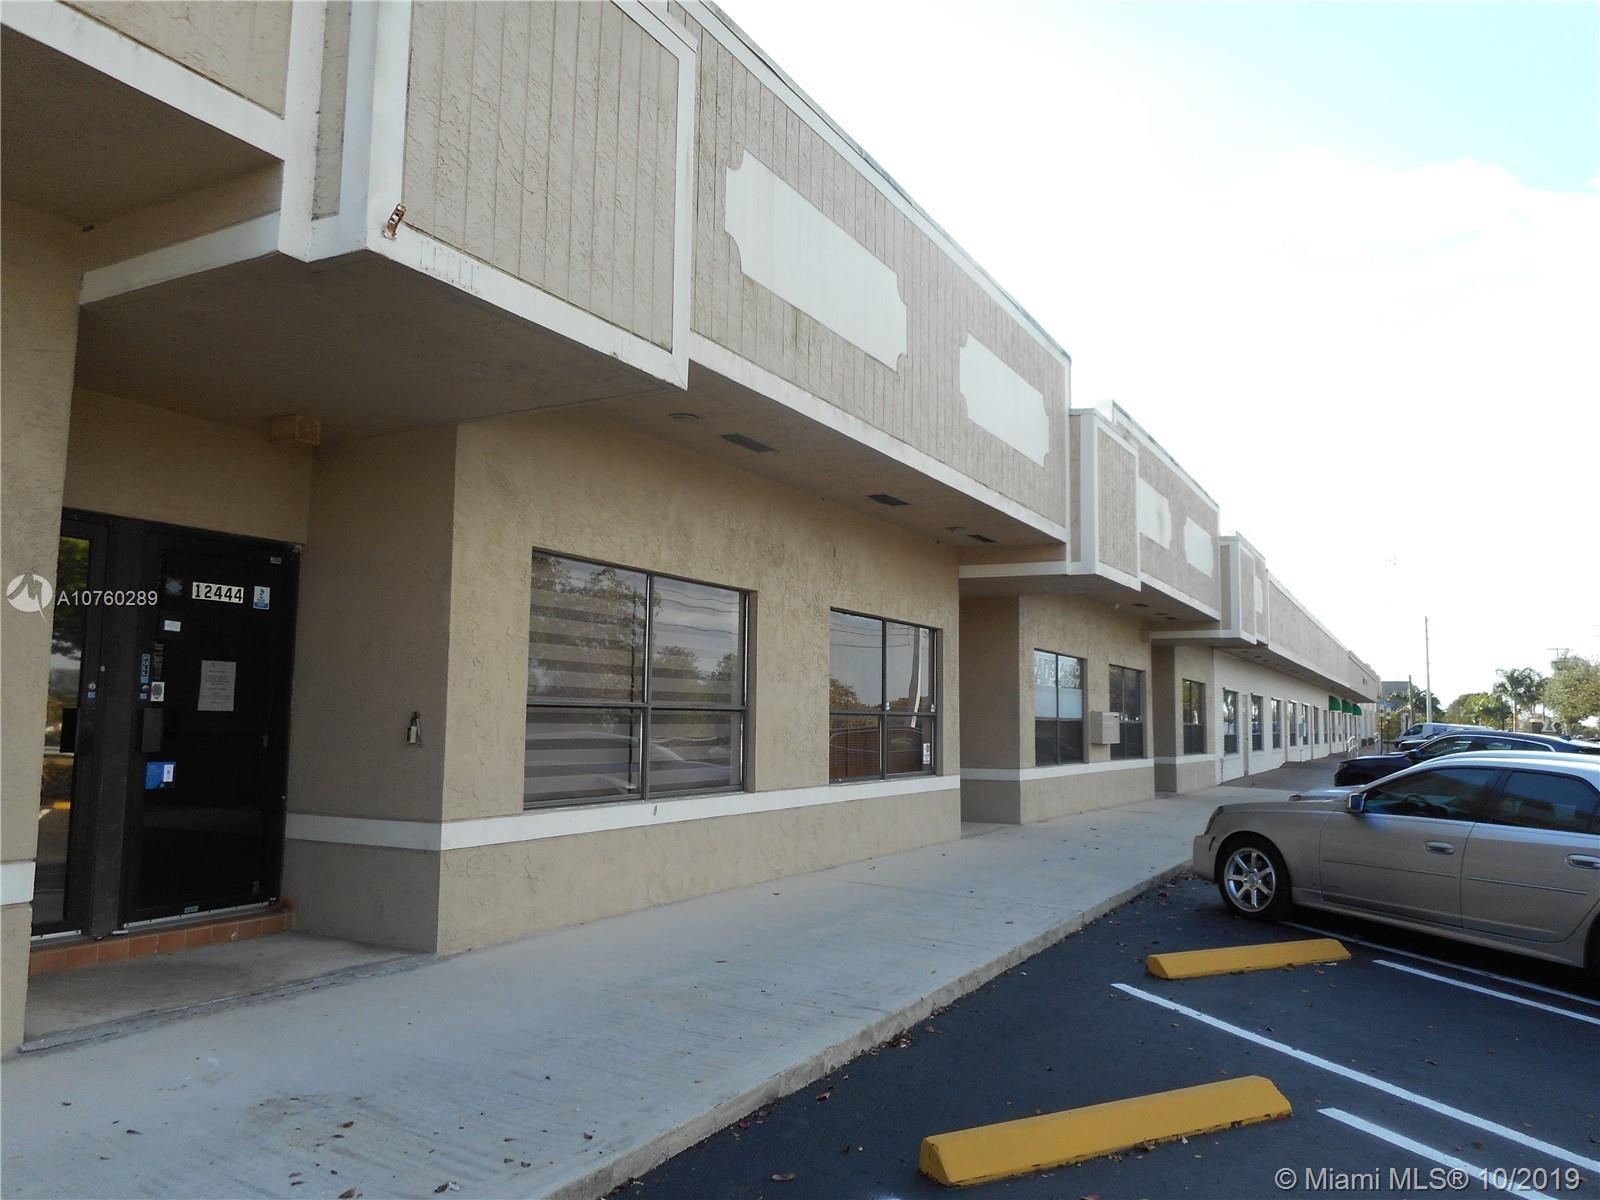 12442-12452 Wiles Rd., Coral Springs, FL 33076